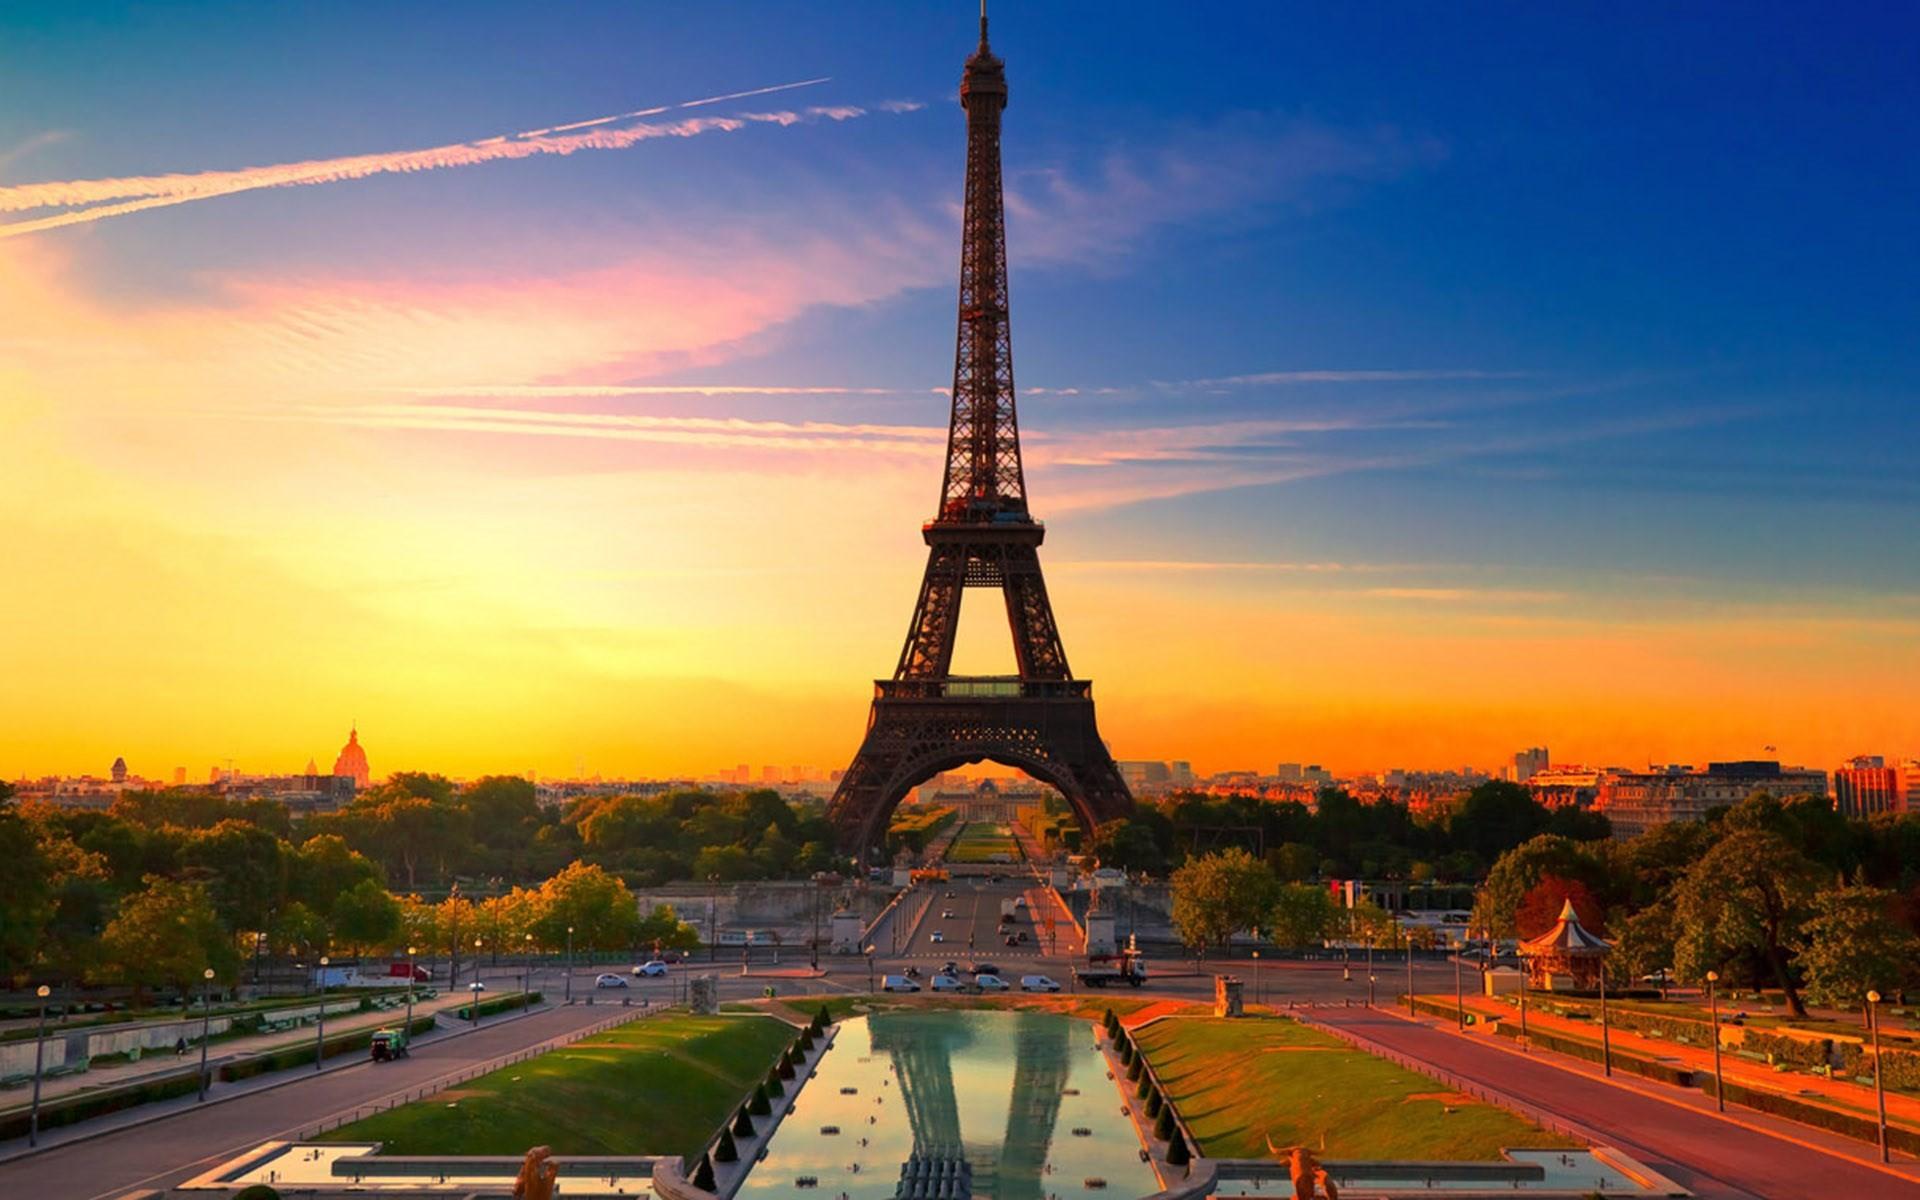 La torre Eiffel al atardecer - 1920x1200